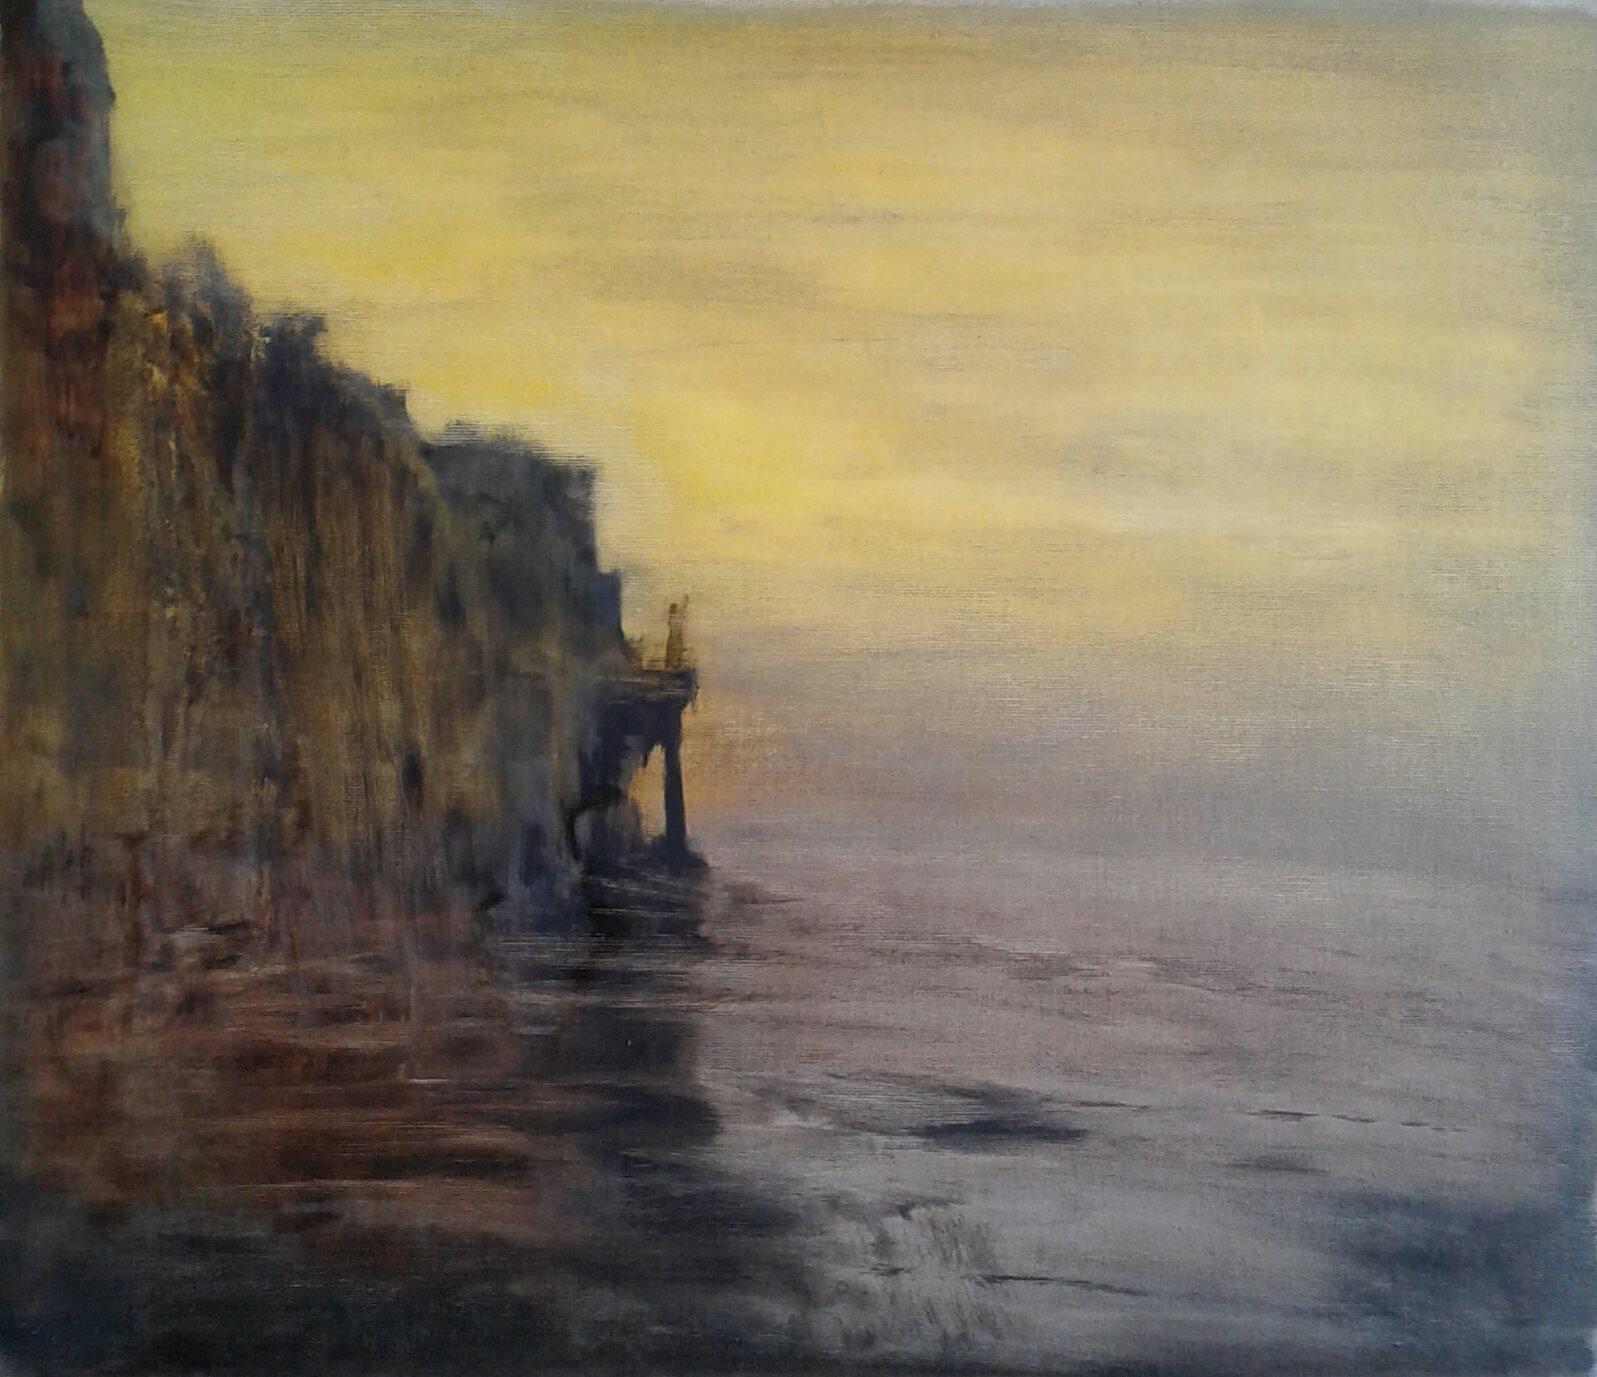 Tuval, yağlıboya 50 x 57 cm